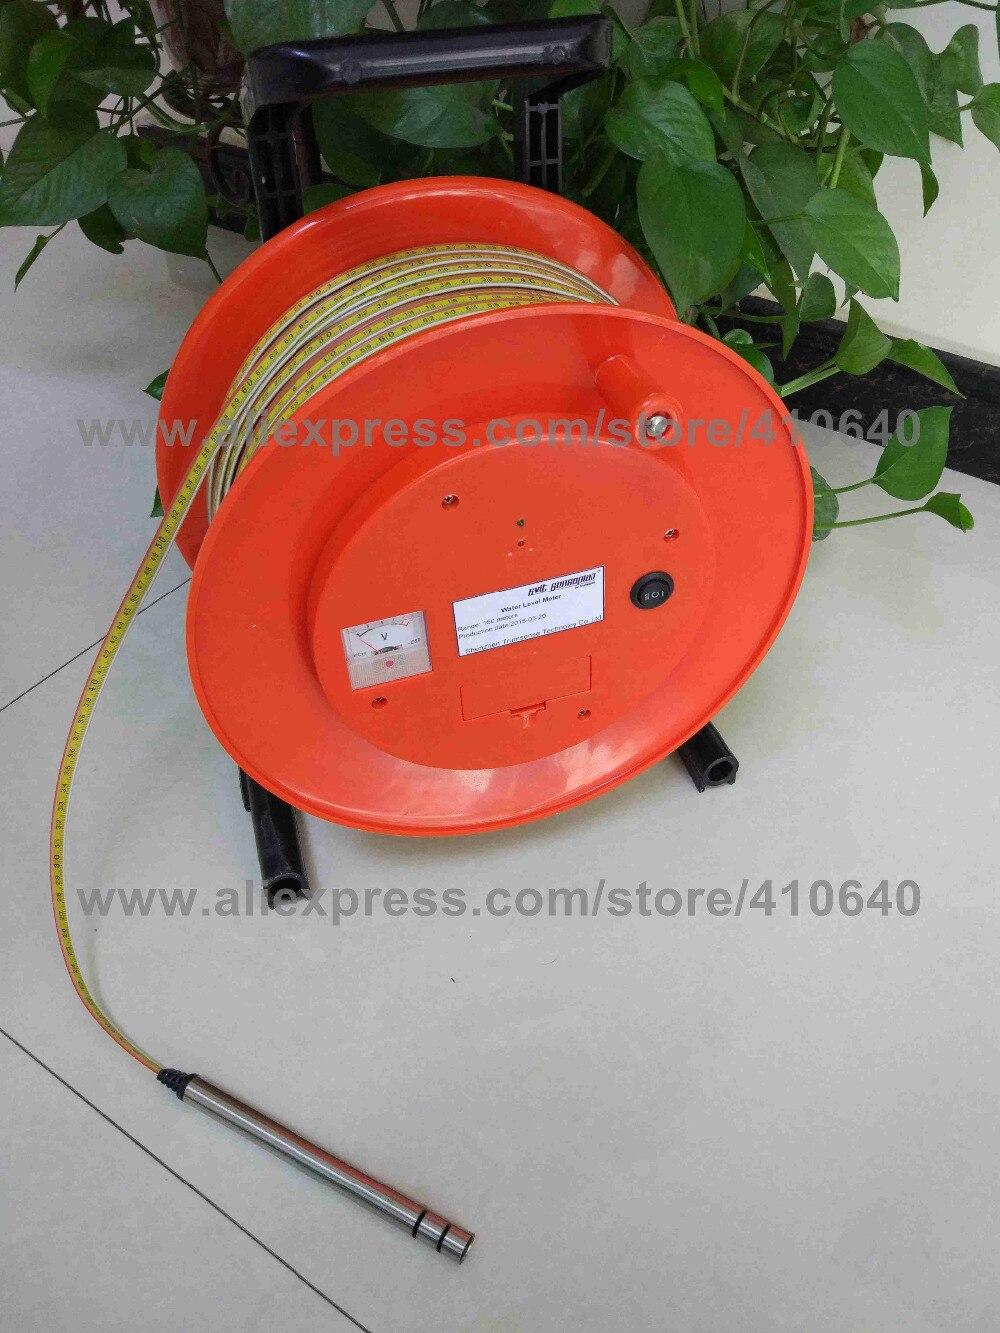 250 Meter Portable Steel Ruler Water Level Meter Well Water Depth Meter For Underground Water Level Monitoring